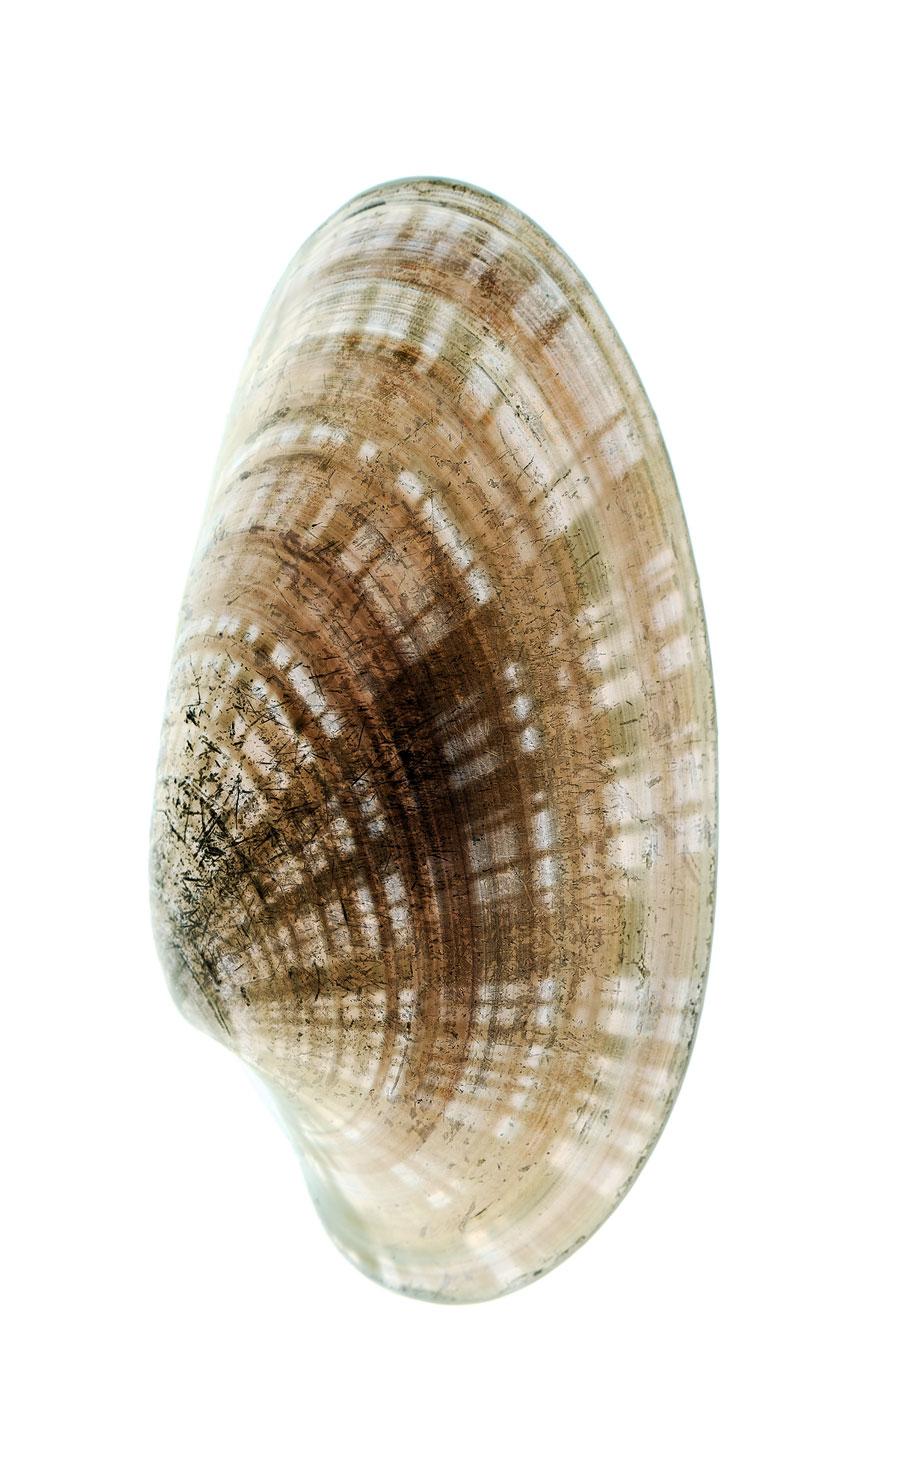 shells052-i.jpg